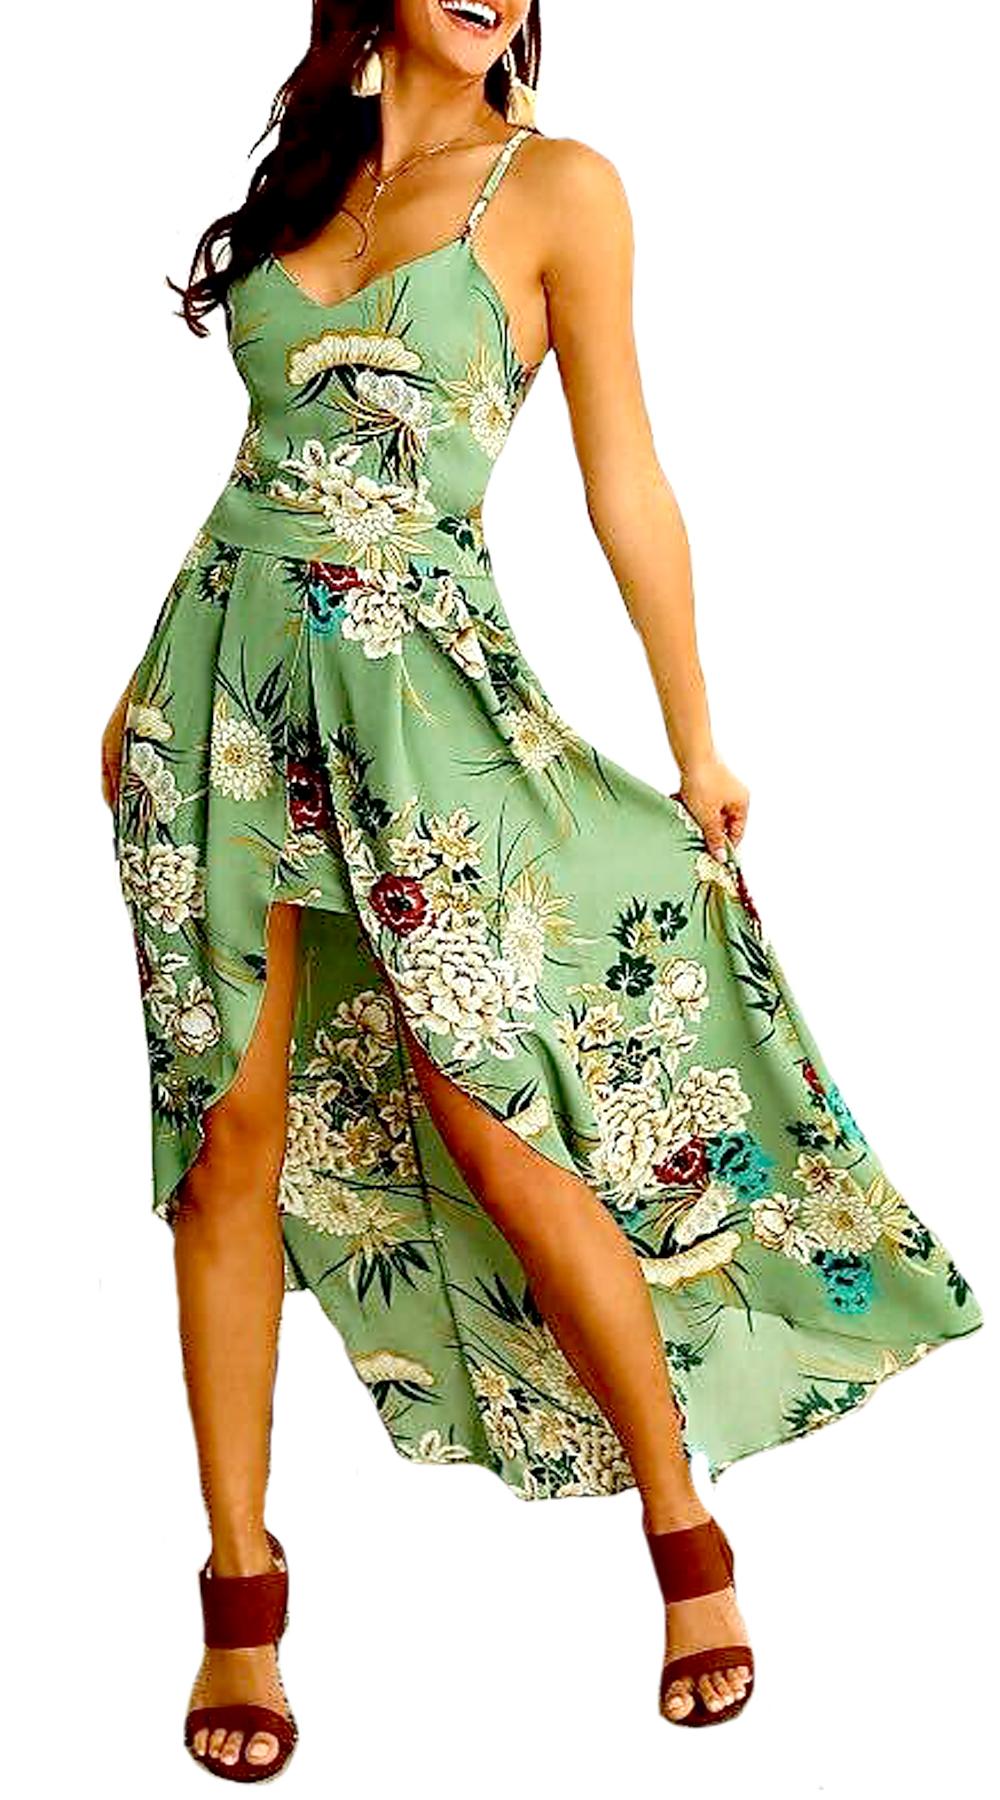 Maxi Floral Ασύμμετρο Φόρεμα - MissReina - SP19SY-58713 φορέματα so girly